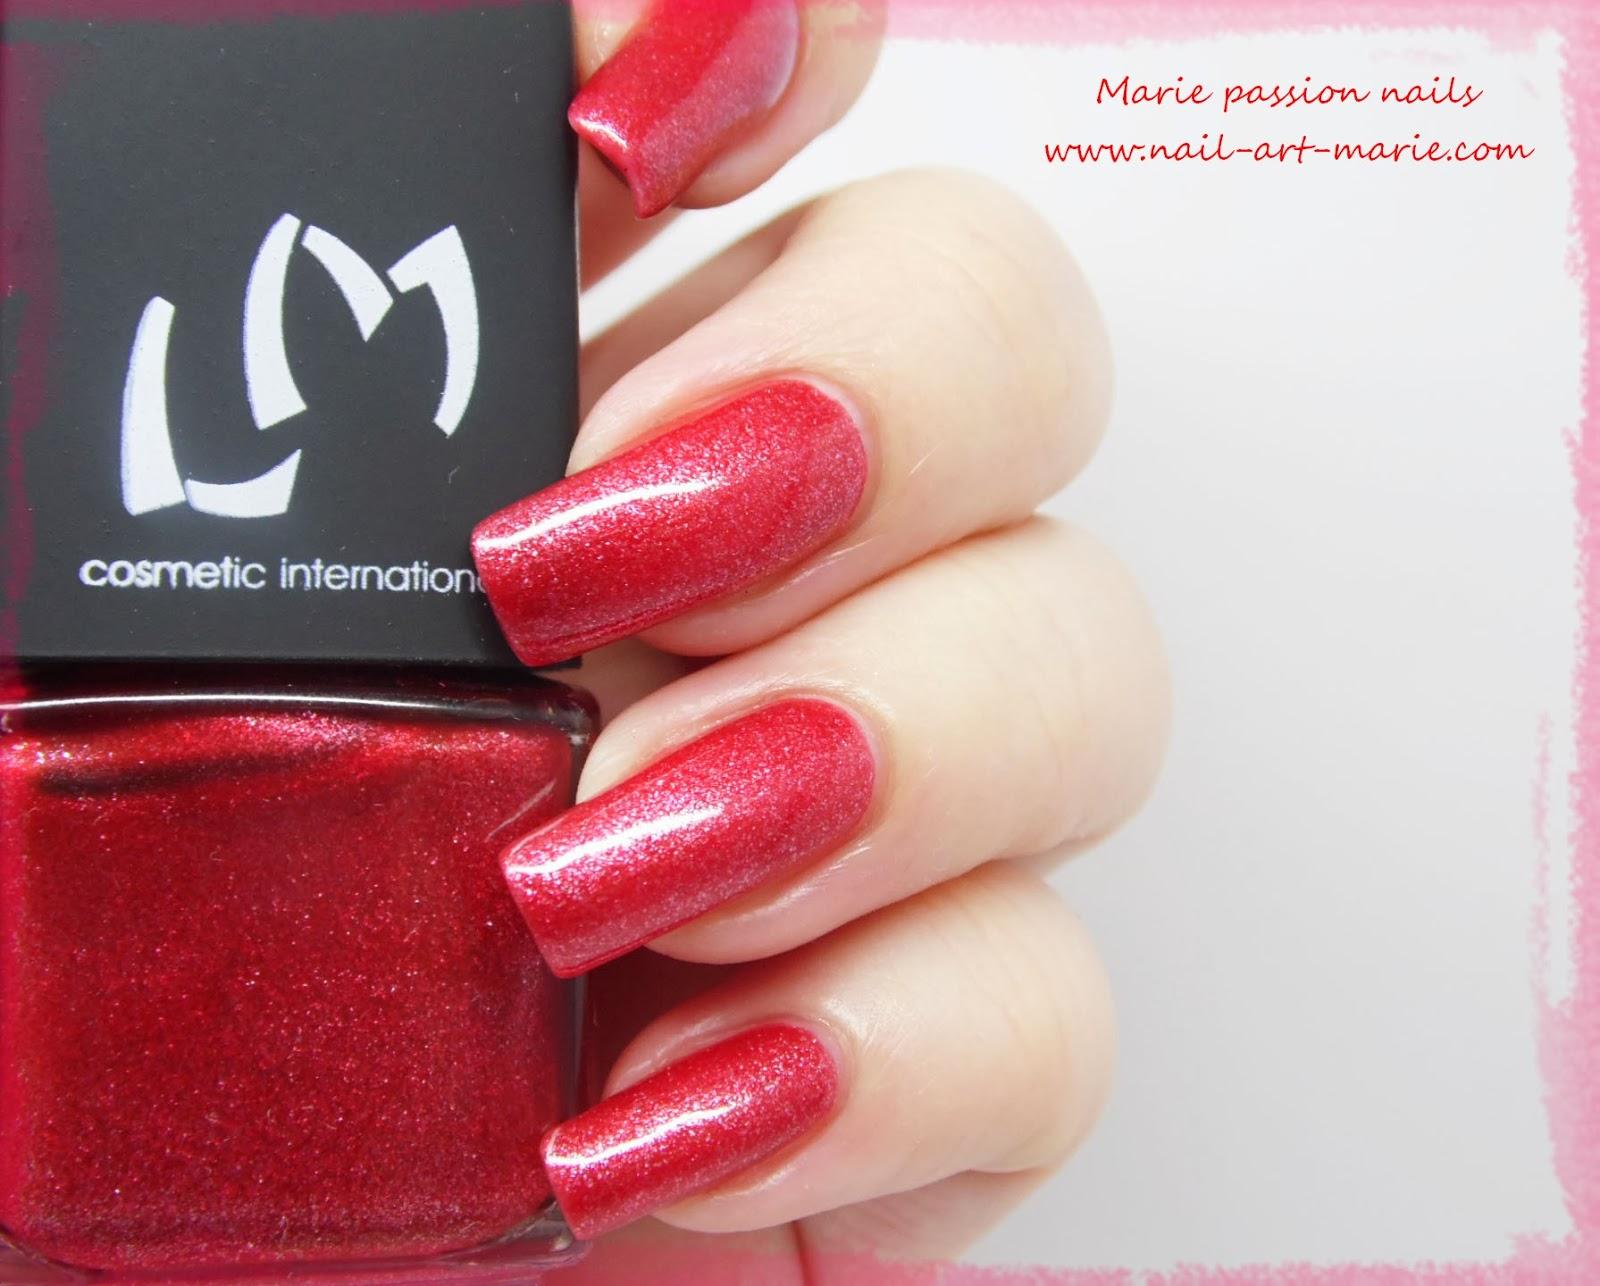 LM Cosmetic Gnaga3